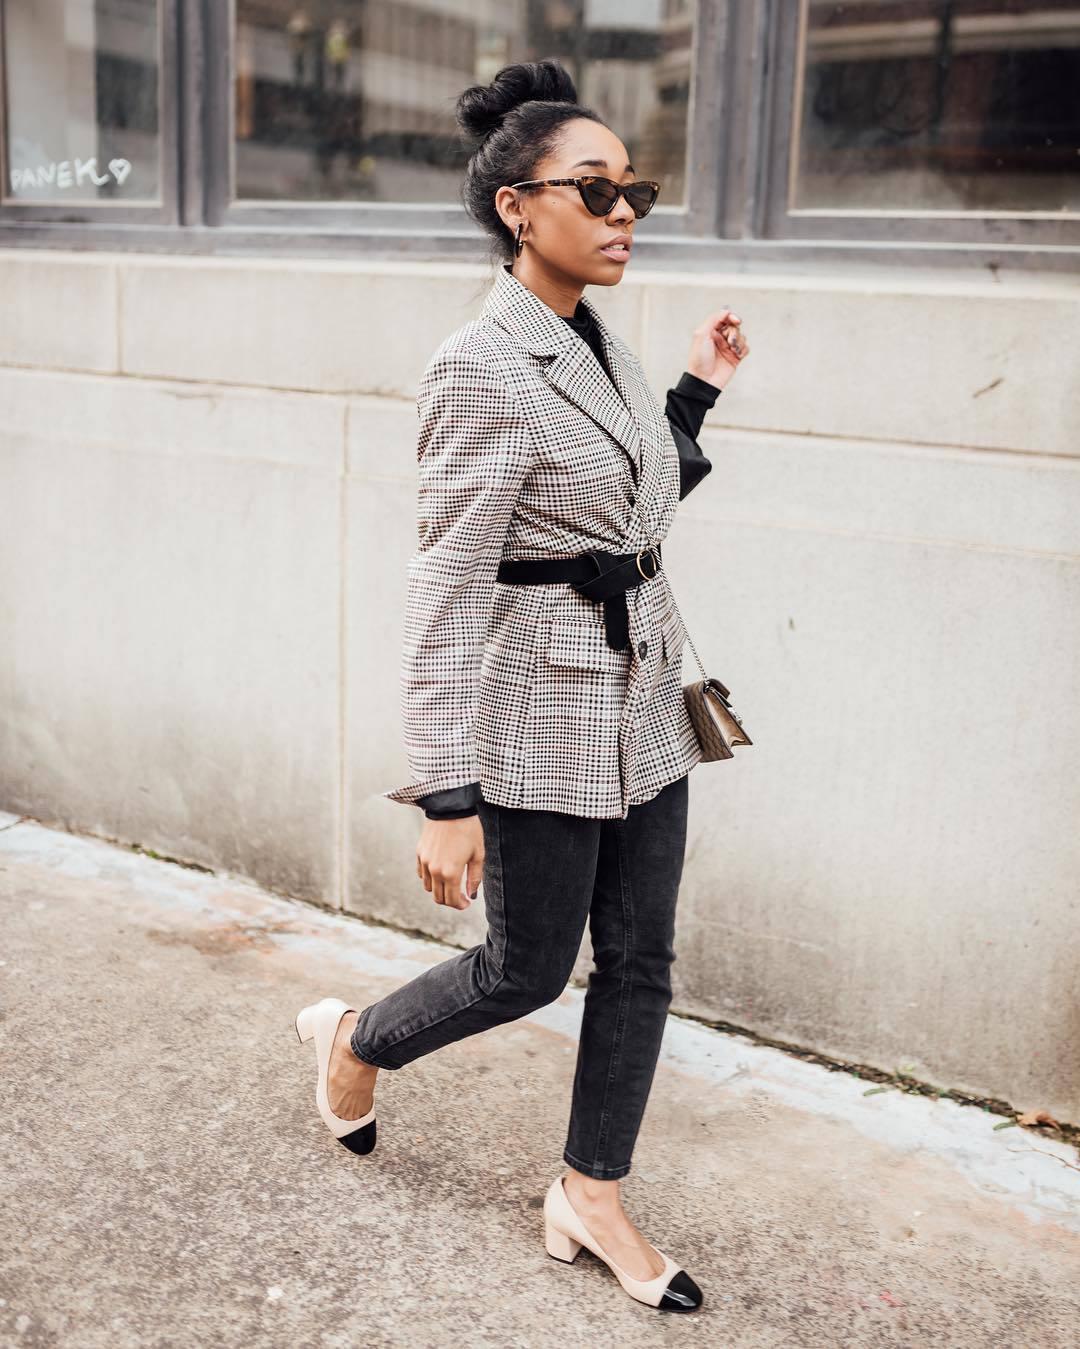 shoes pumps plaid blazer black belt crossbody bag black top black jeans